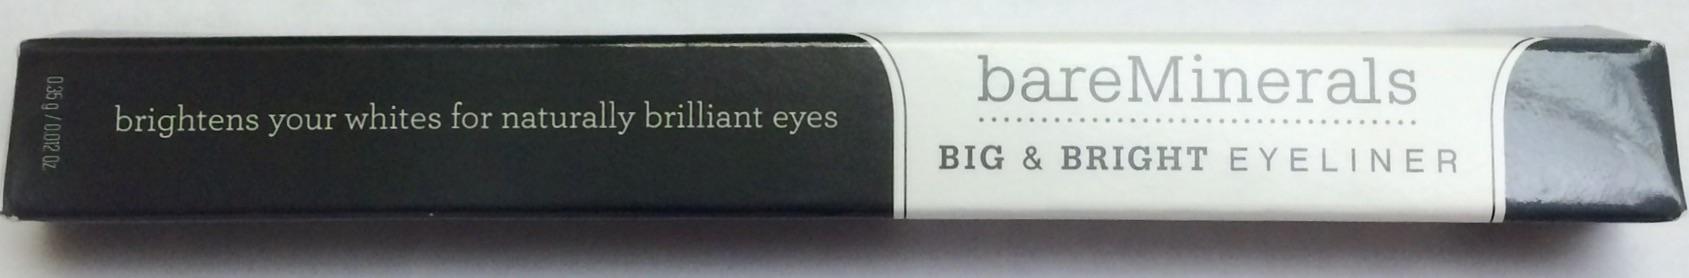 Bare Minerals Big & Bright Eyeliner - Charcoal